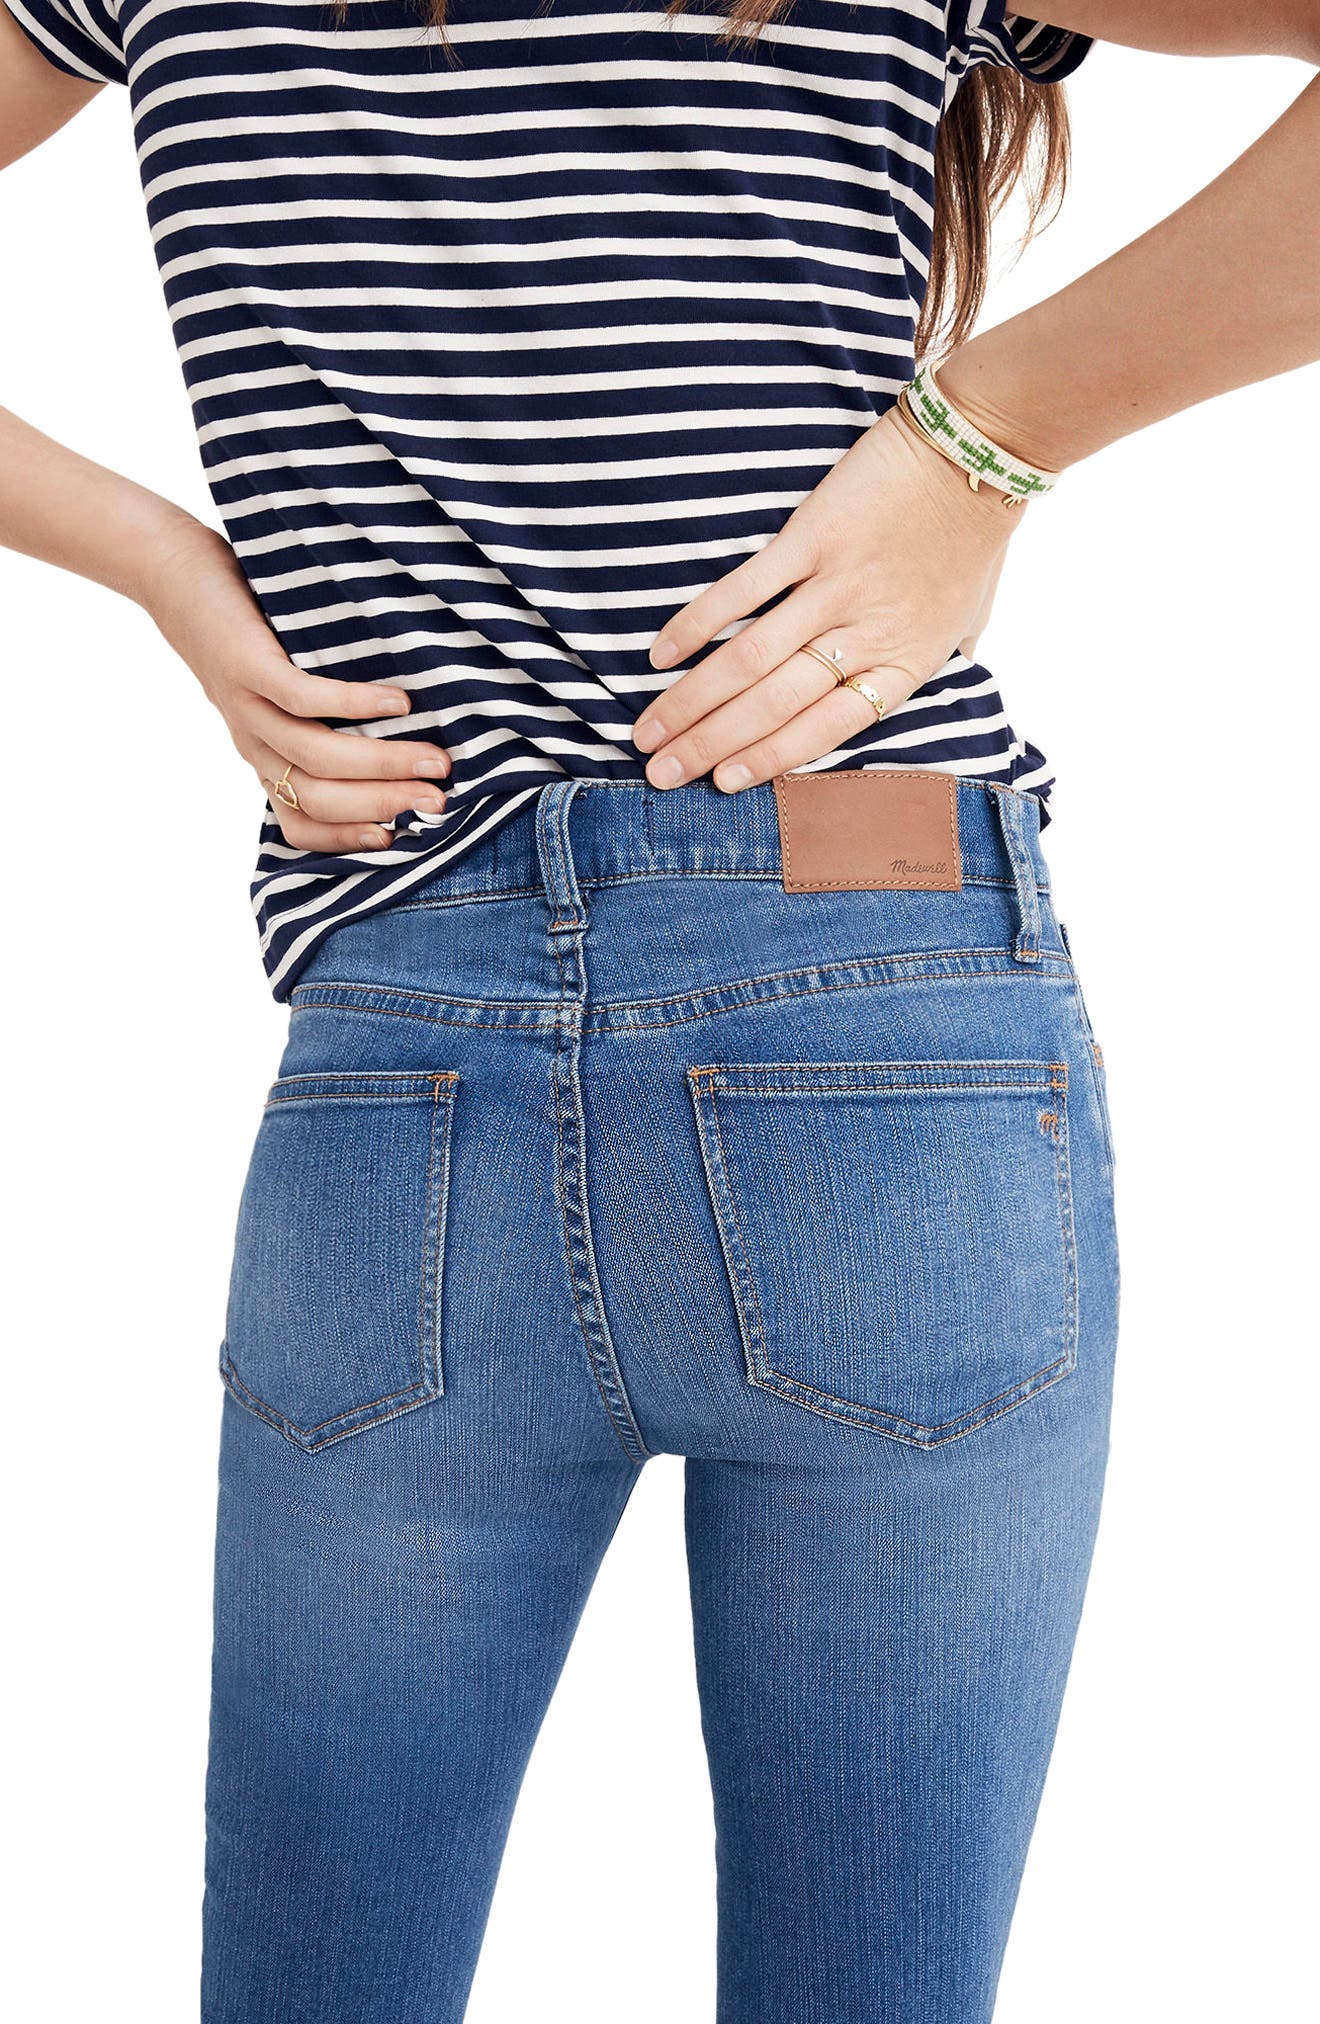 Roadtripper Crop Skinny Jeans,                             Alternate thumbnail 2, color,                             Declan Wash